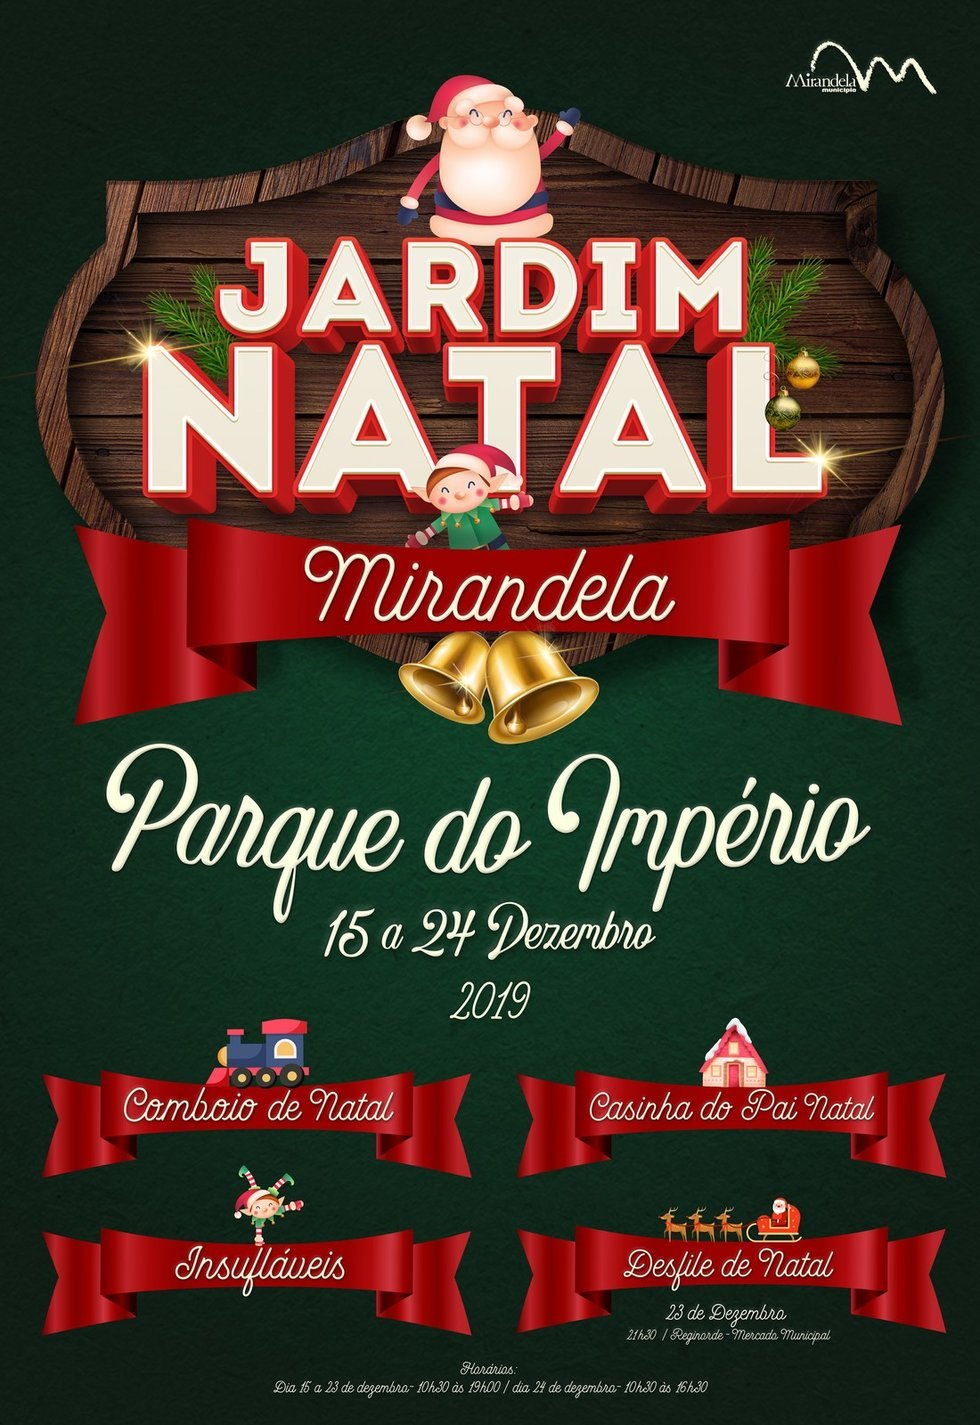 Jardim Natal 2019